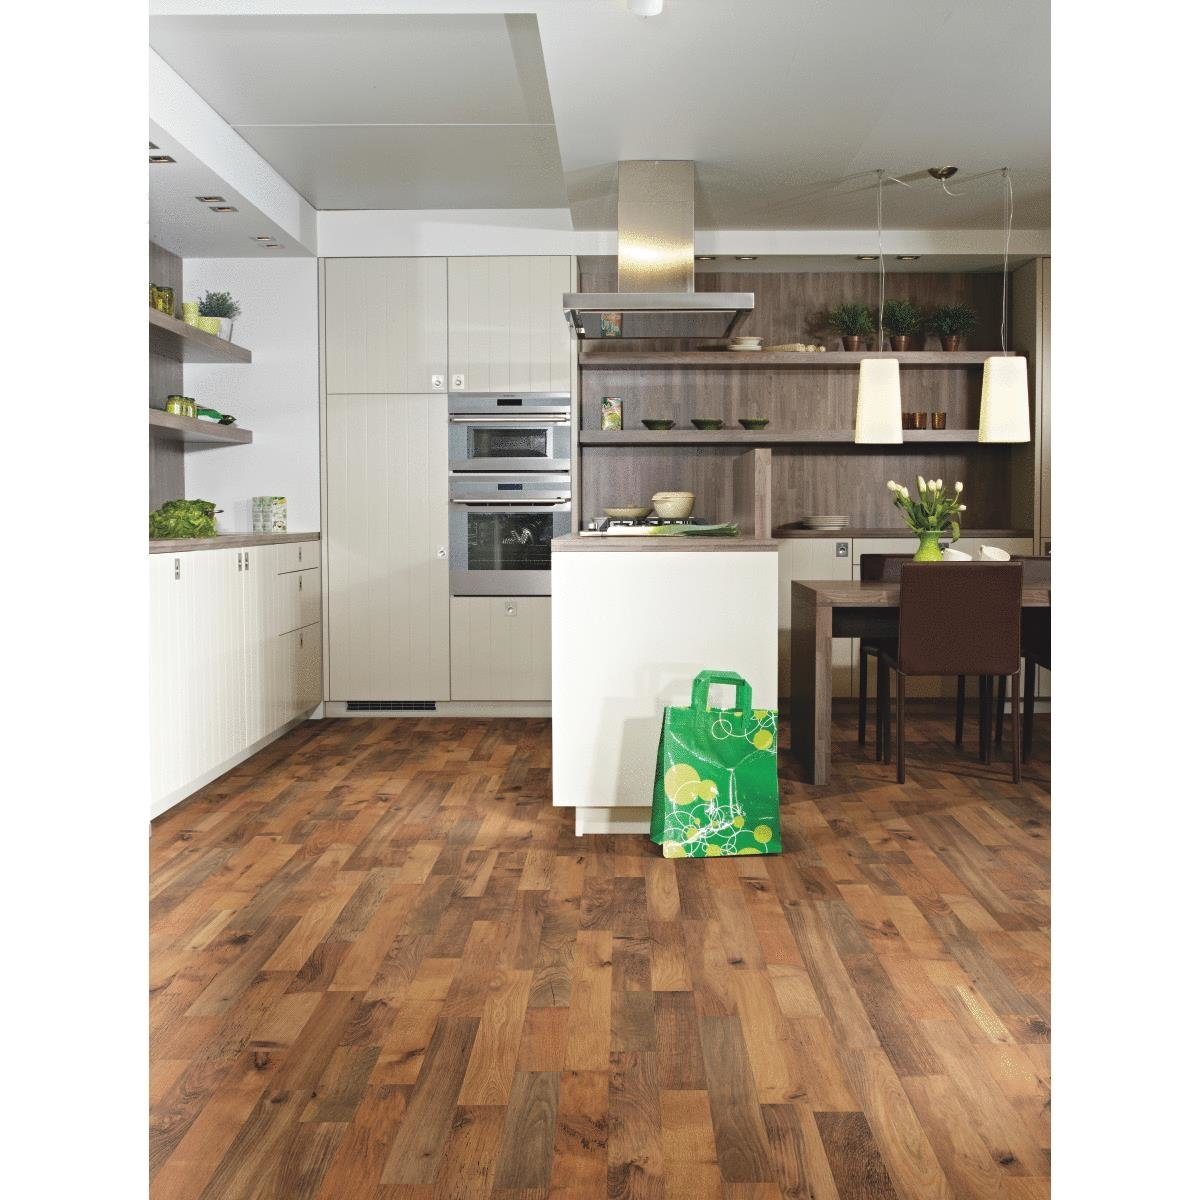 Glueless laminate flooring ... balterio right step 7.0 mm vitality original series glueless laminate  flooring KBKJDCI